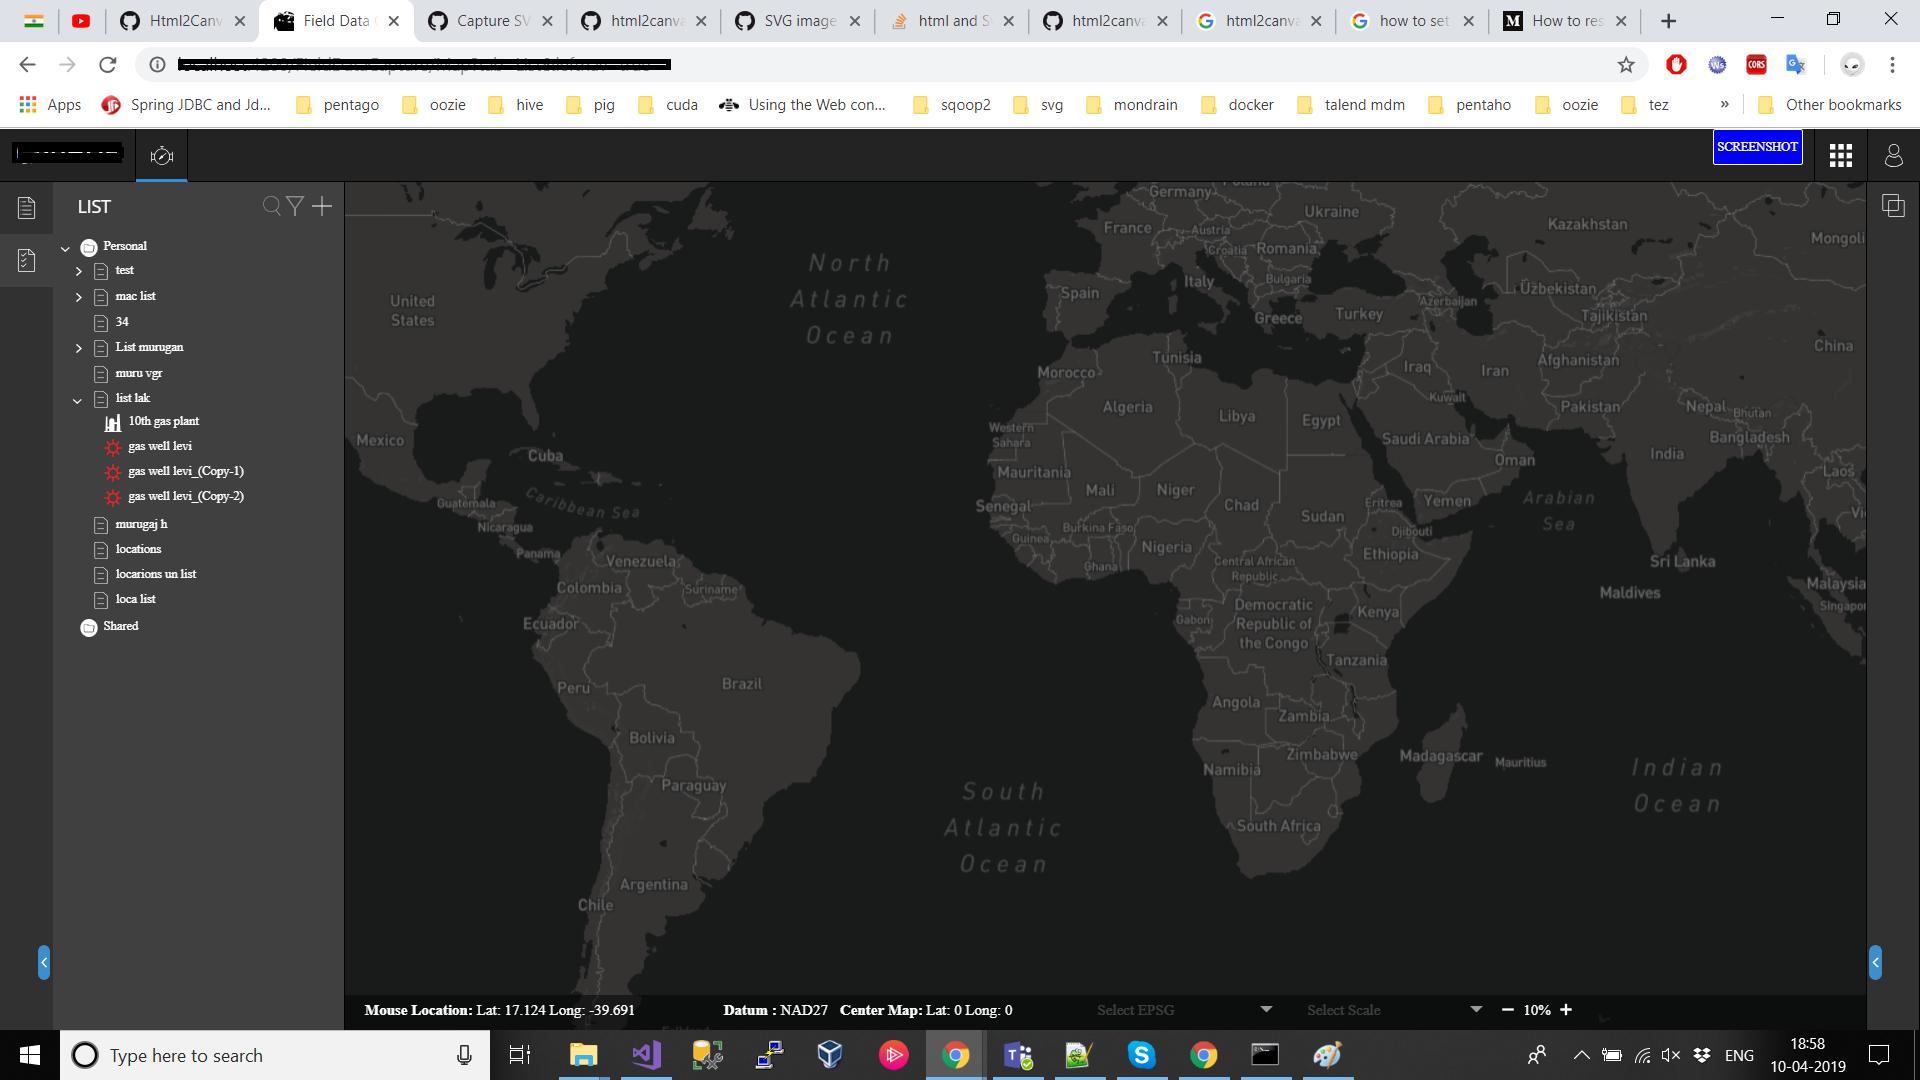 html2canvas_orginal_Before export